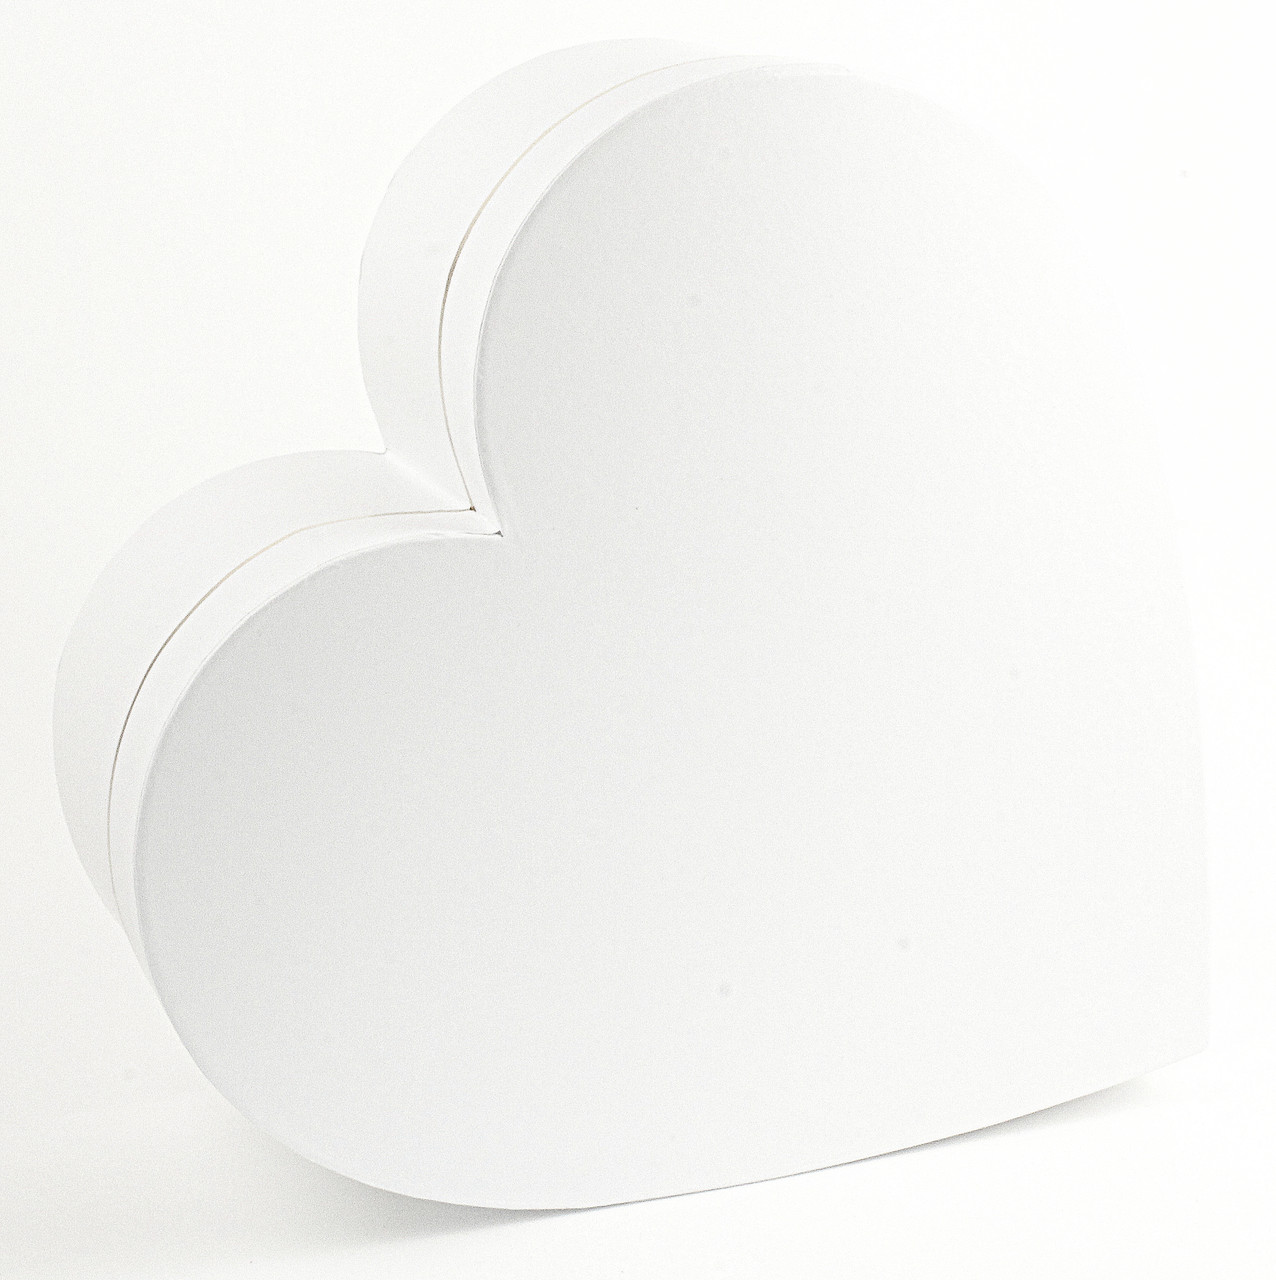 Подарочная коробка белая в форме сердца 15 x 13 x 7.2 см